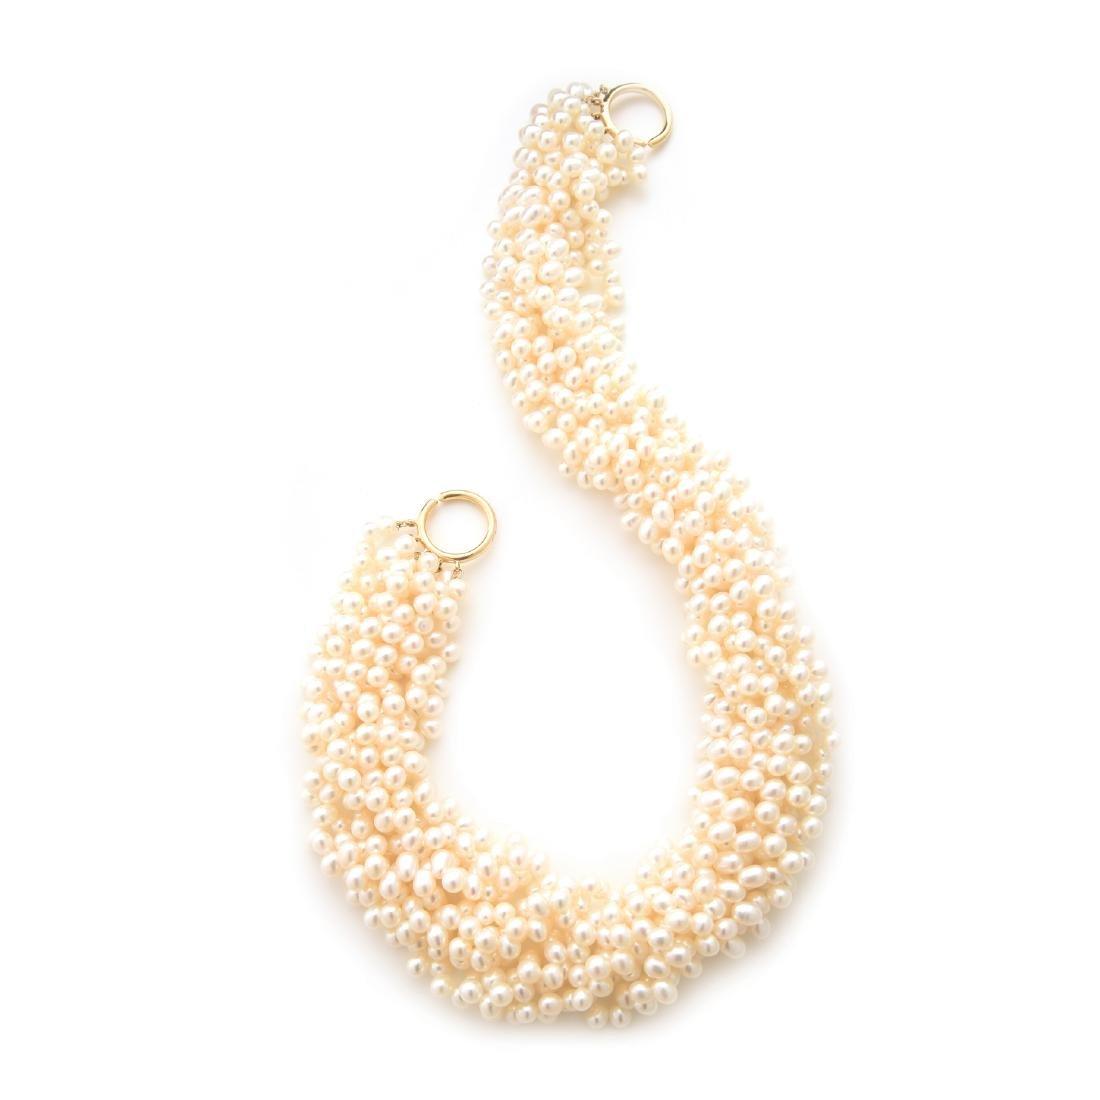 "Tiffany Paloma Picasso ""Torsade"" Cultured Pearl"